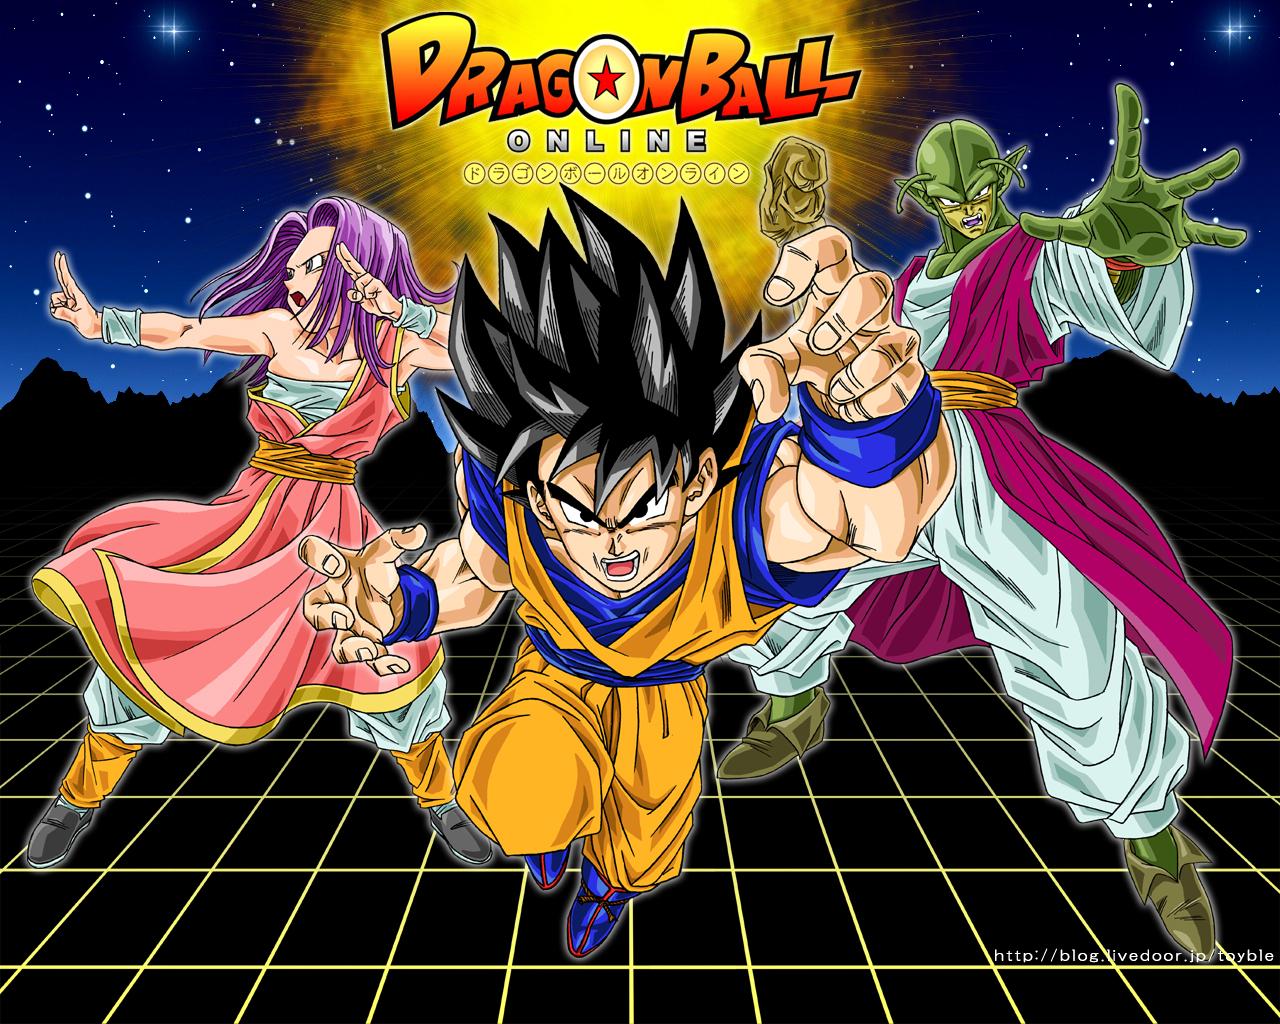 http://1.bp.blogspot.com/-bc9a5Ve-C_g/T2UdkfLESwI/AAAAAAAAAkA/KAgVrVmDOiA/s1600/Dragon+Ball+Online+Toyble.jpg